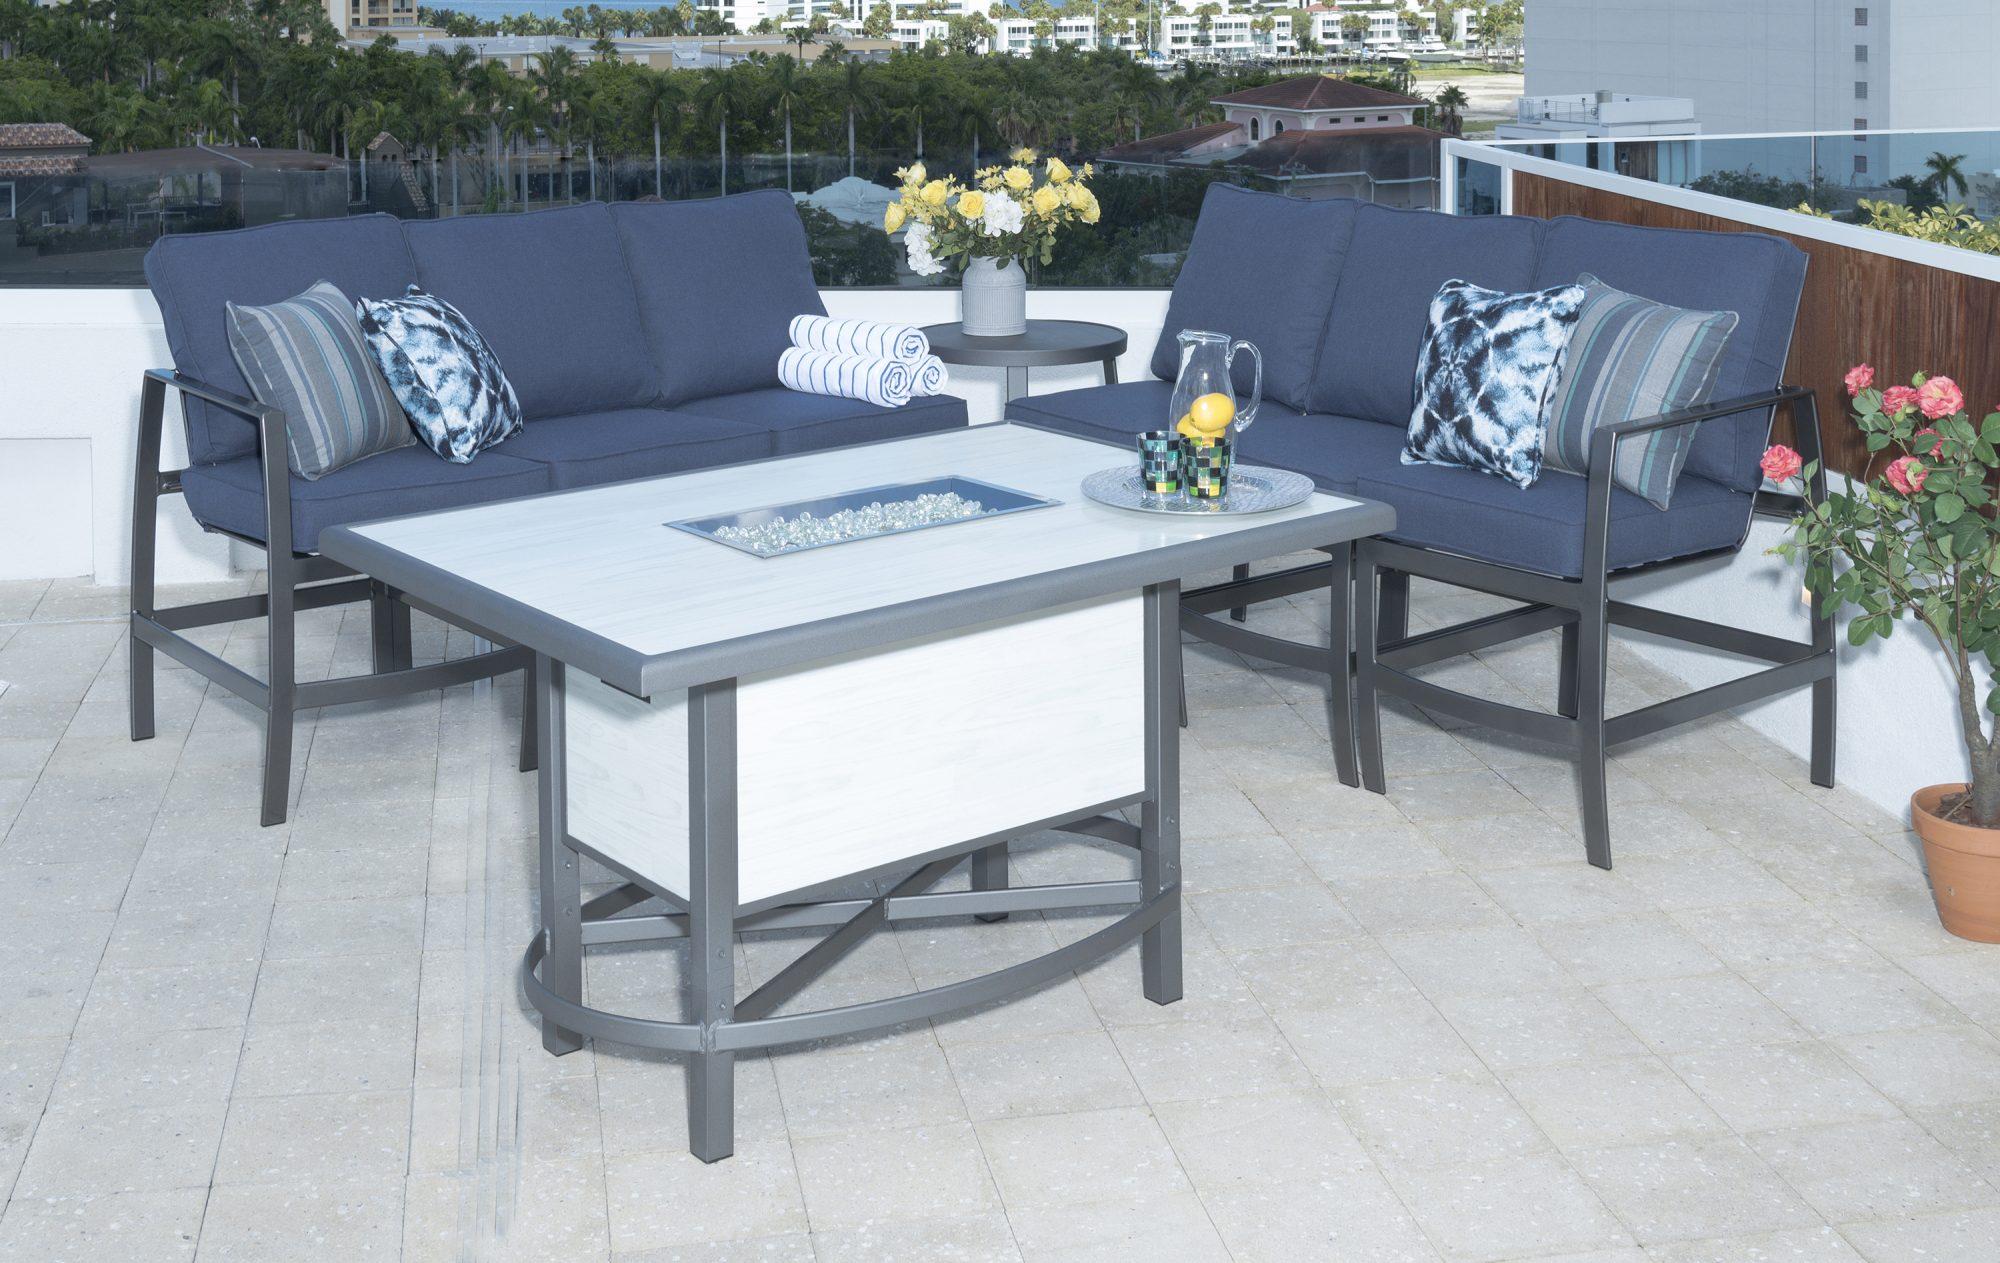 outdoordesign krisp balcony height collection - bay